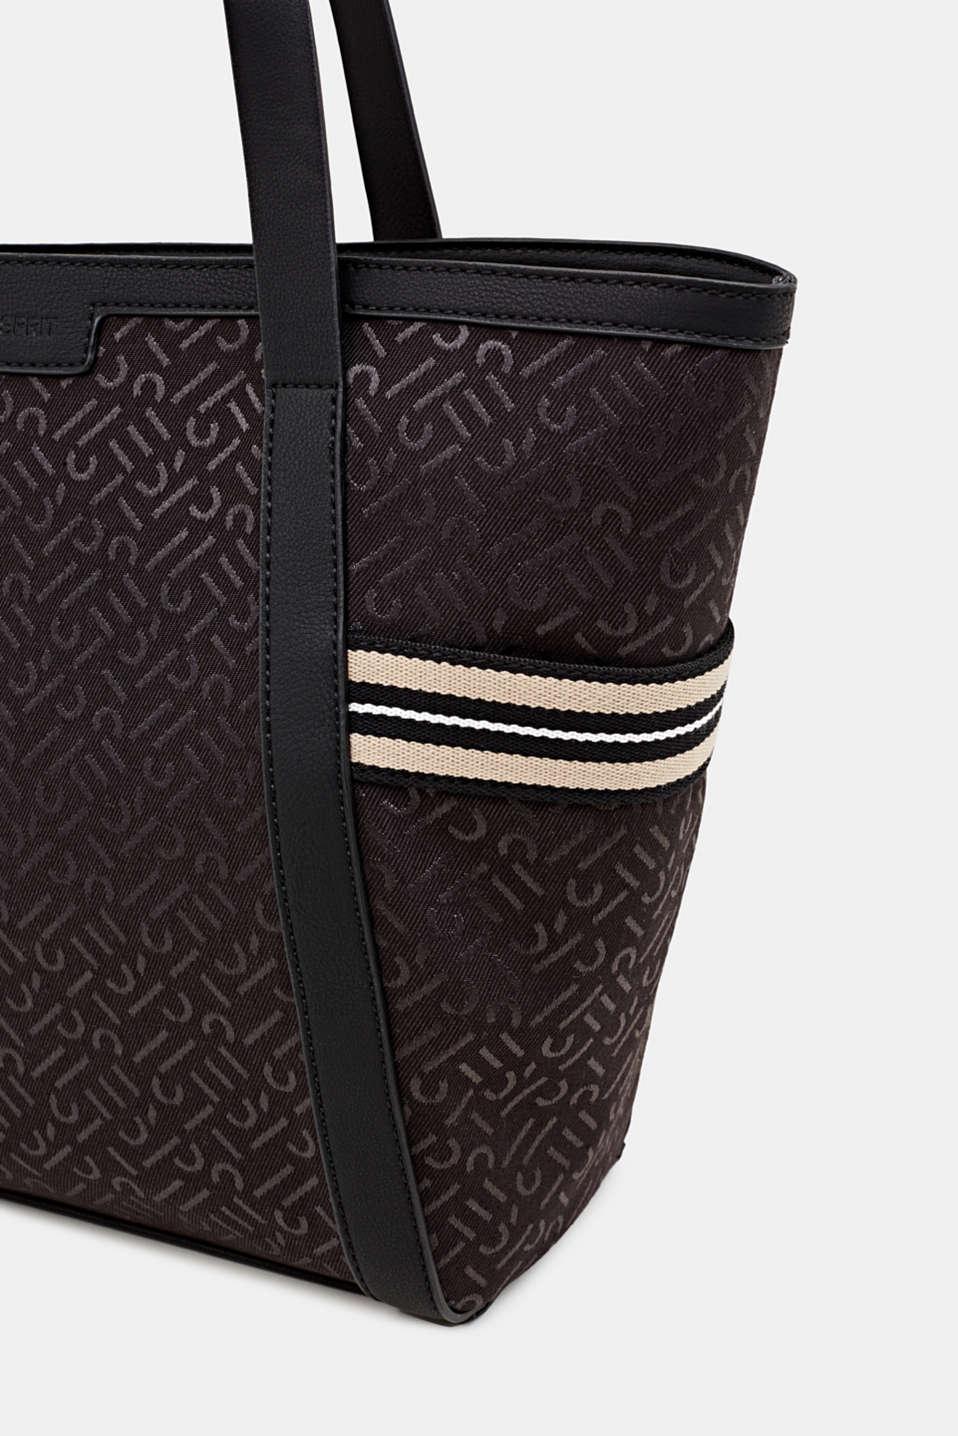 Monogram tote bag in a mix of materials, BLACK, detail image number 3